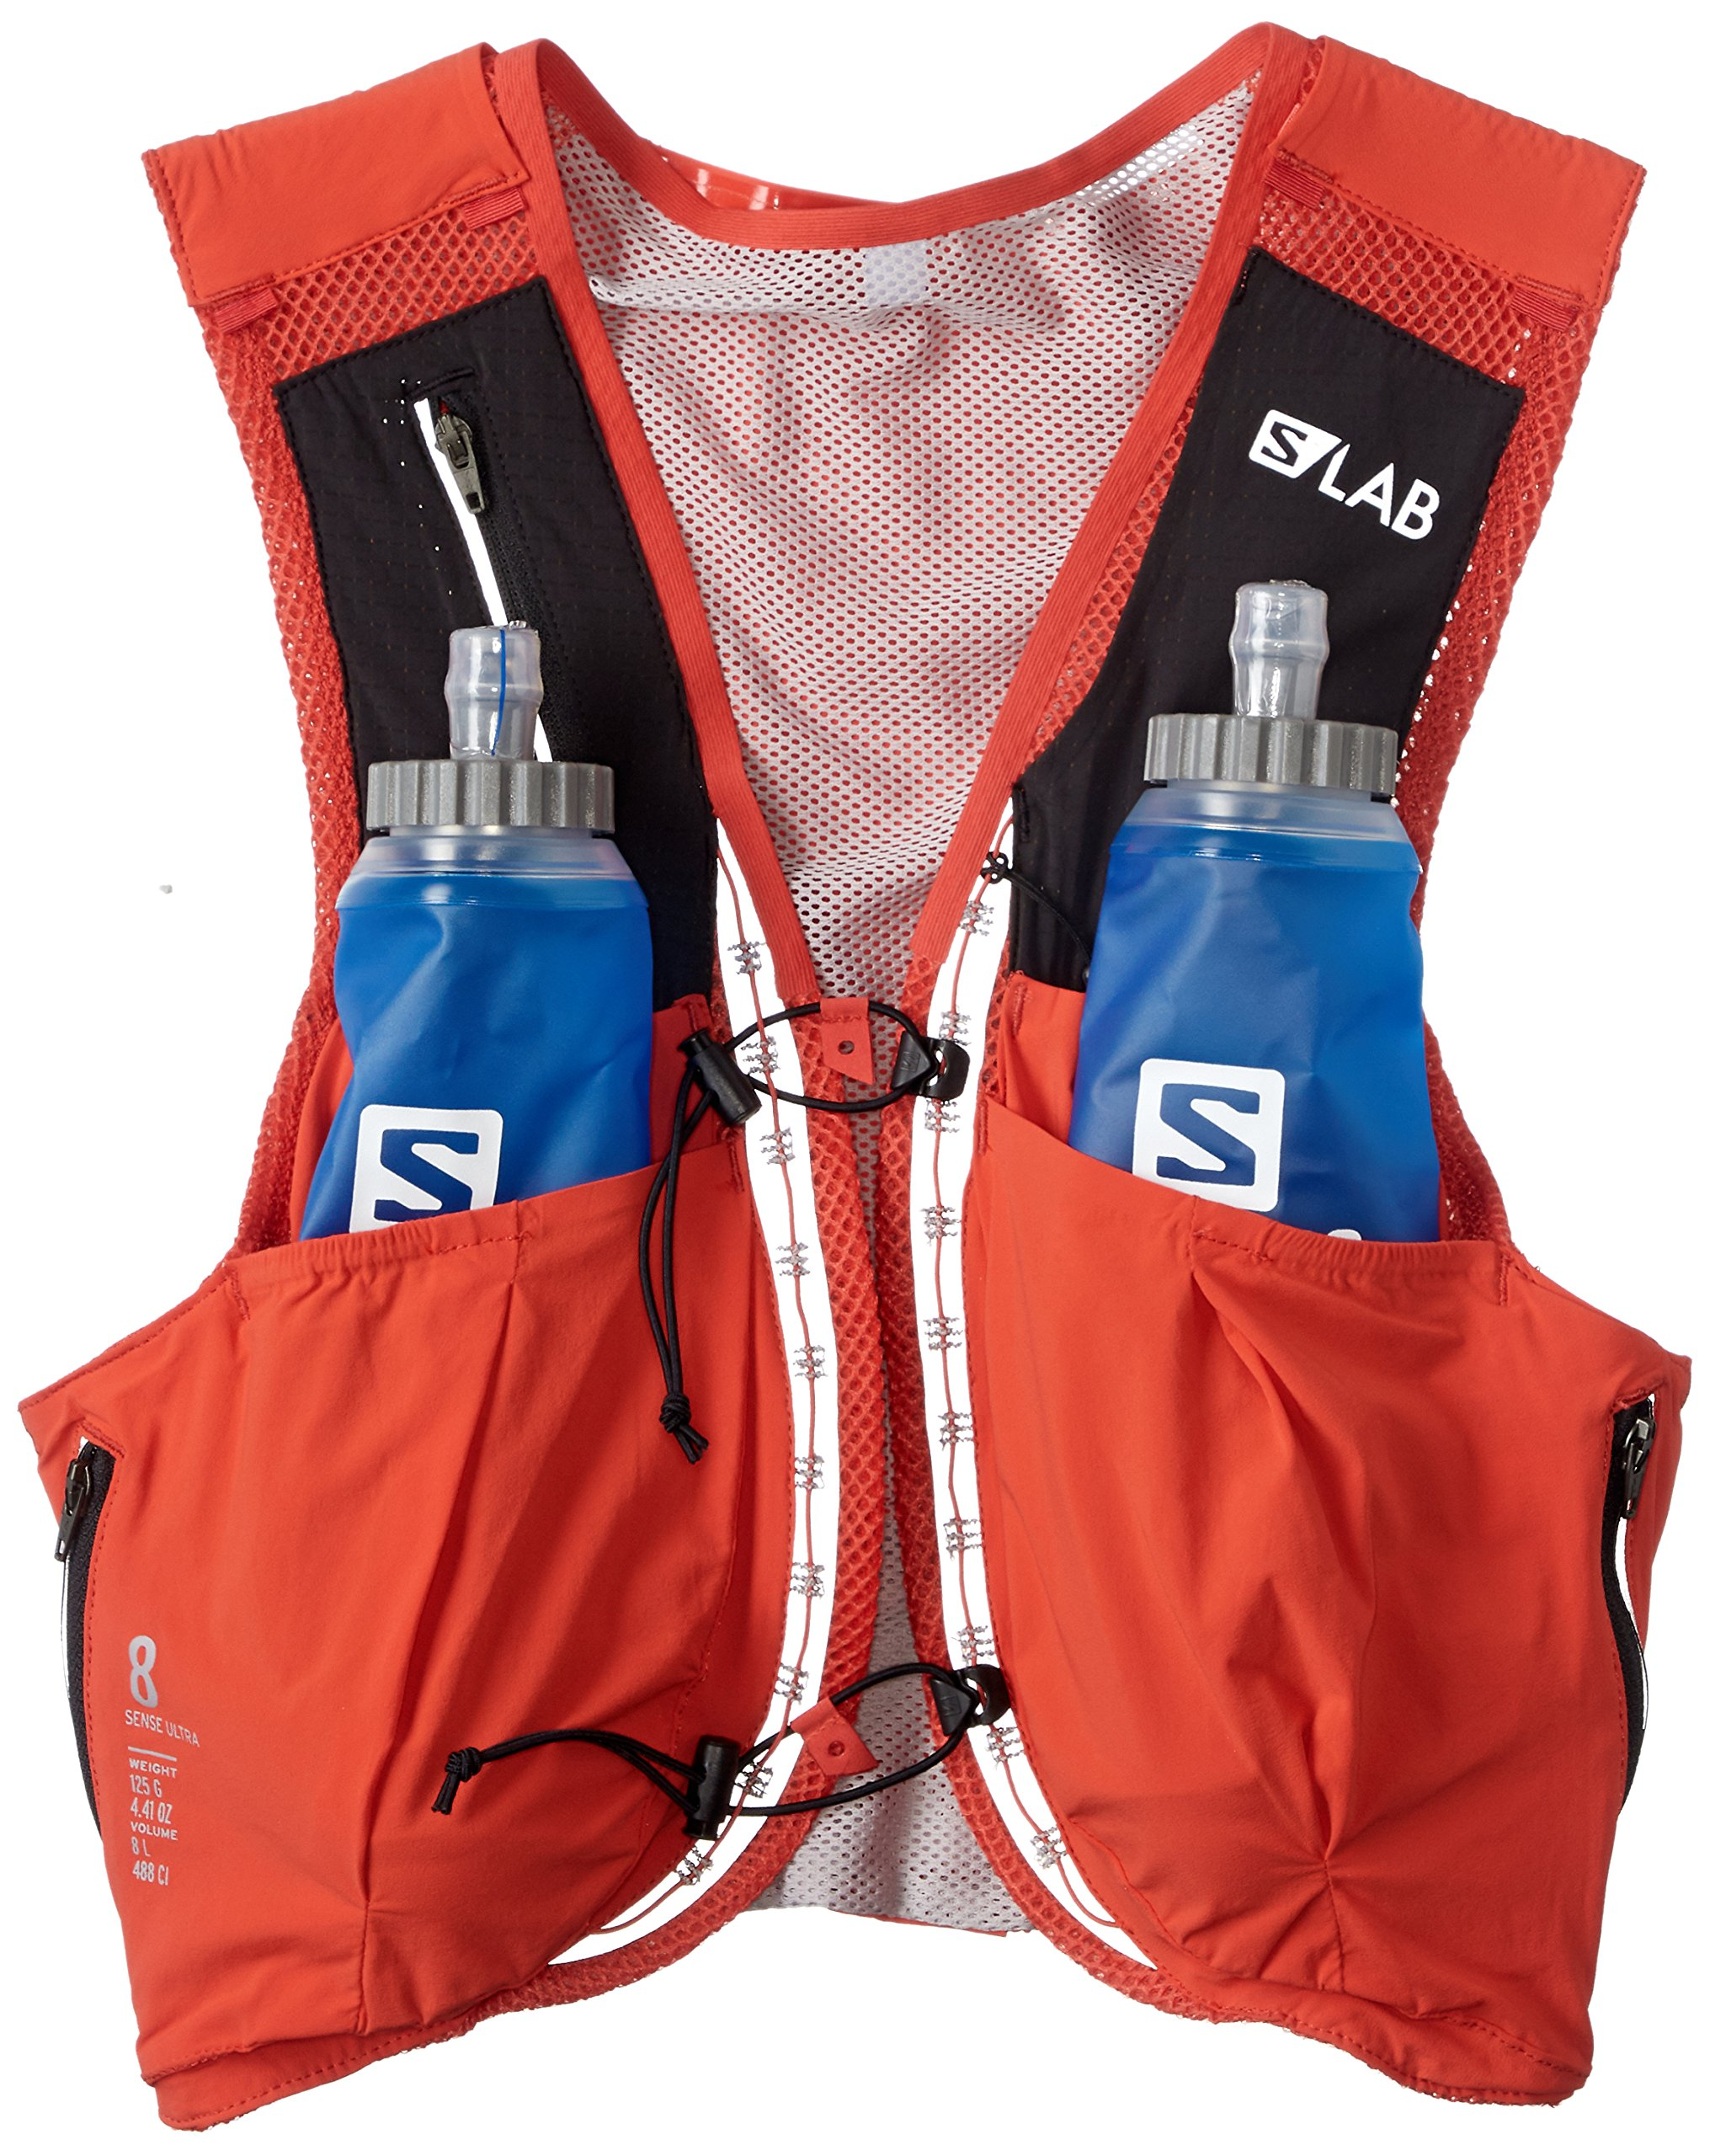 Salomon Unisex S/Lab Sense Ultra 8 Set Hydration Vest, Racing Red, Medium by Salomon (Image #1)